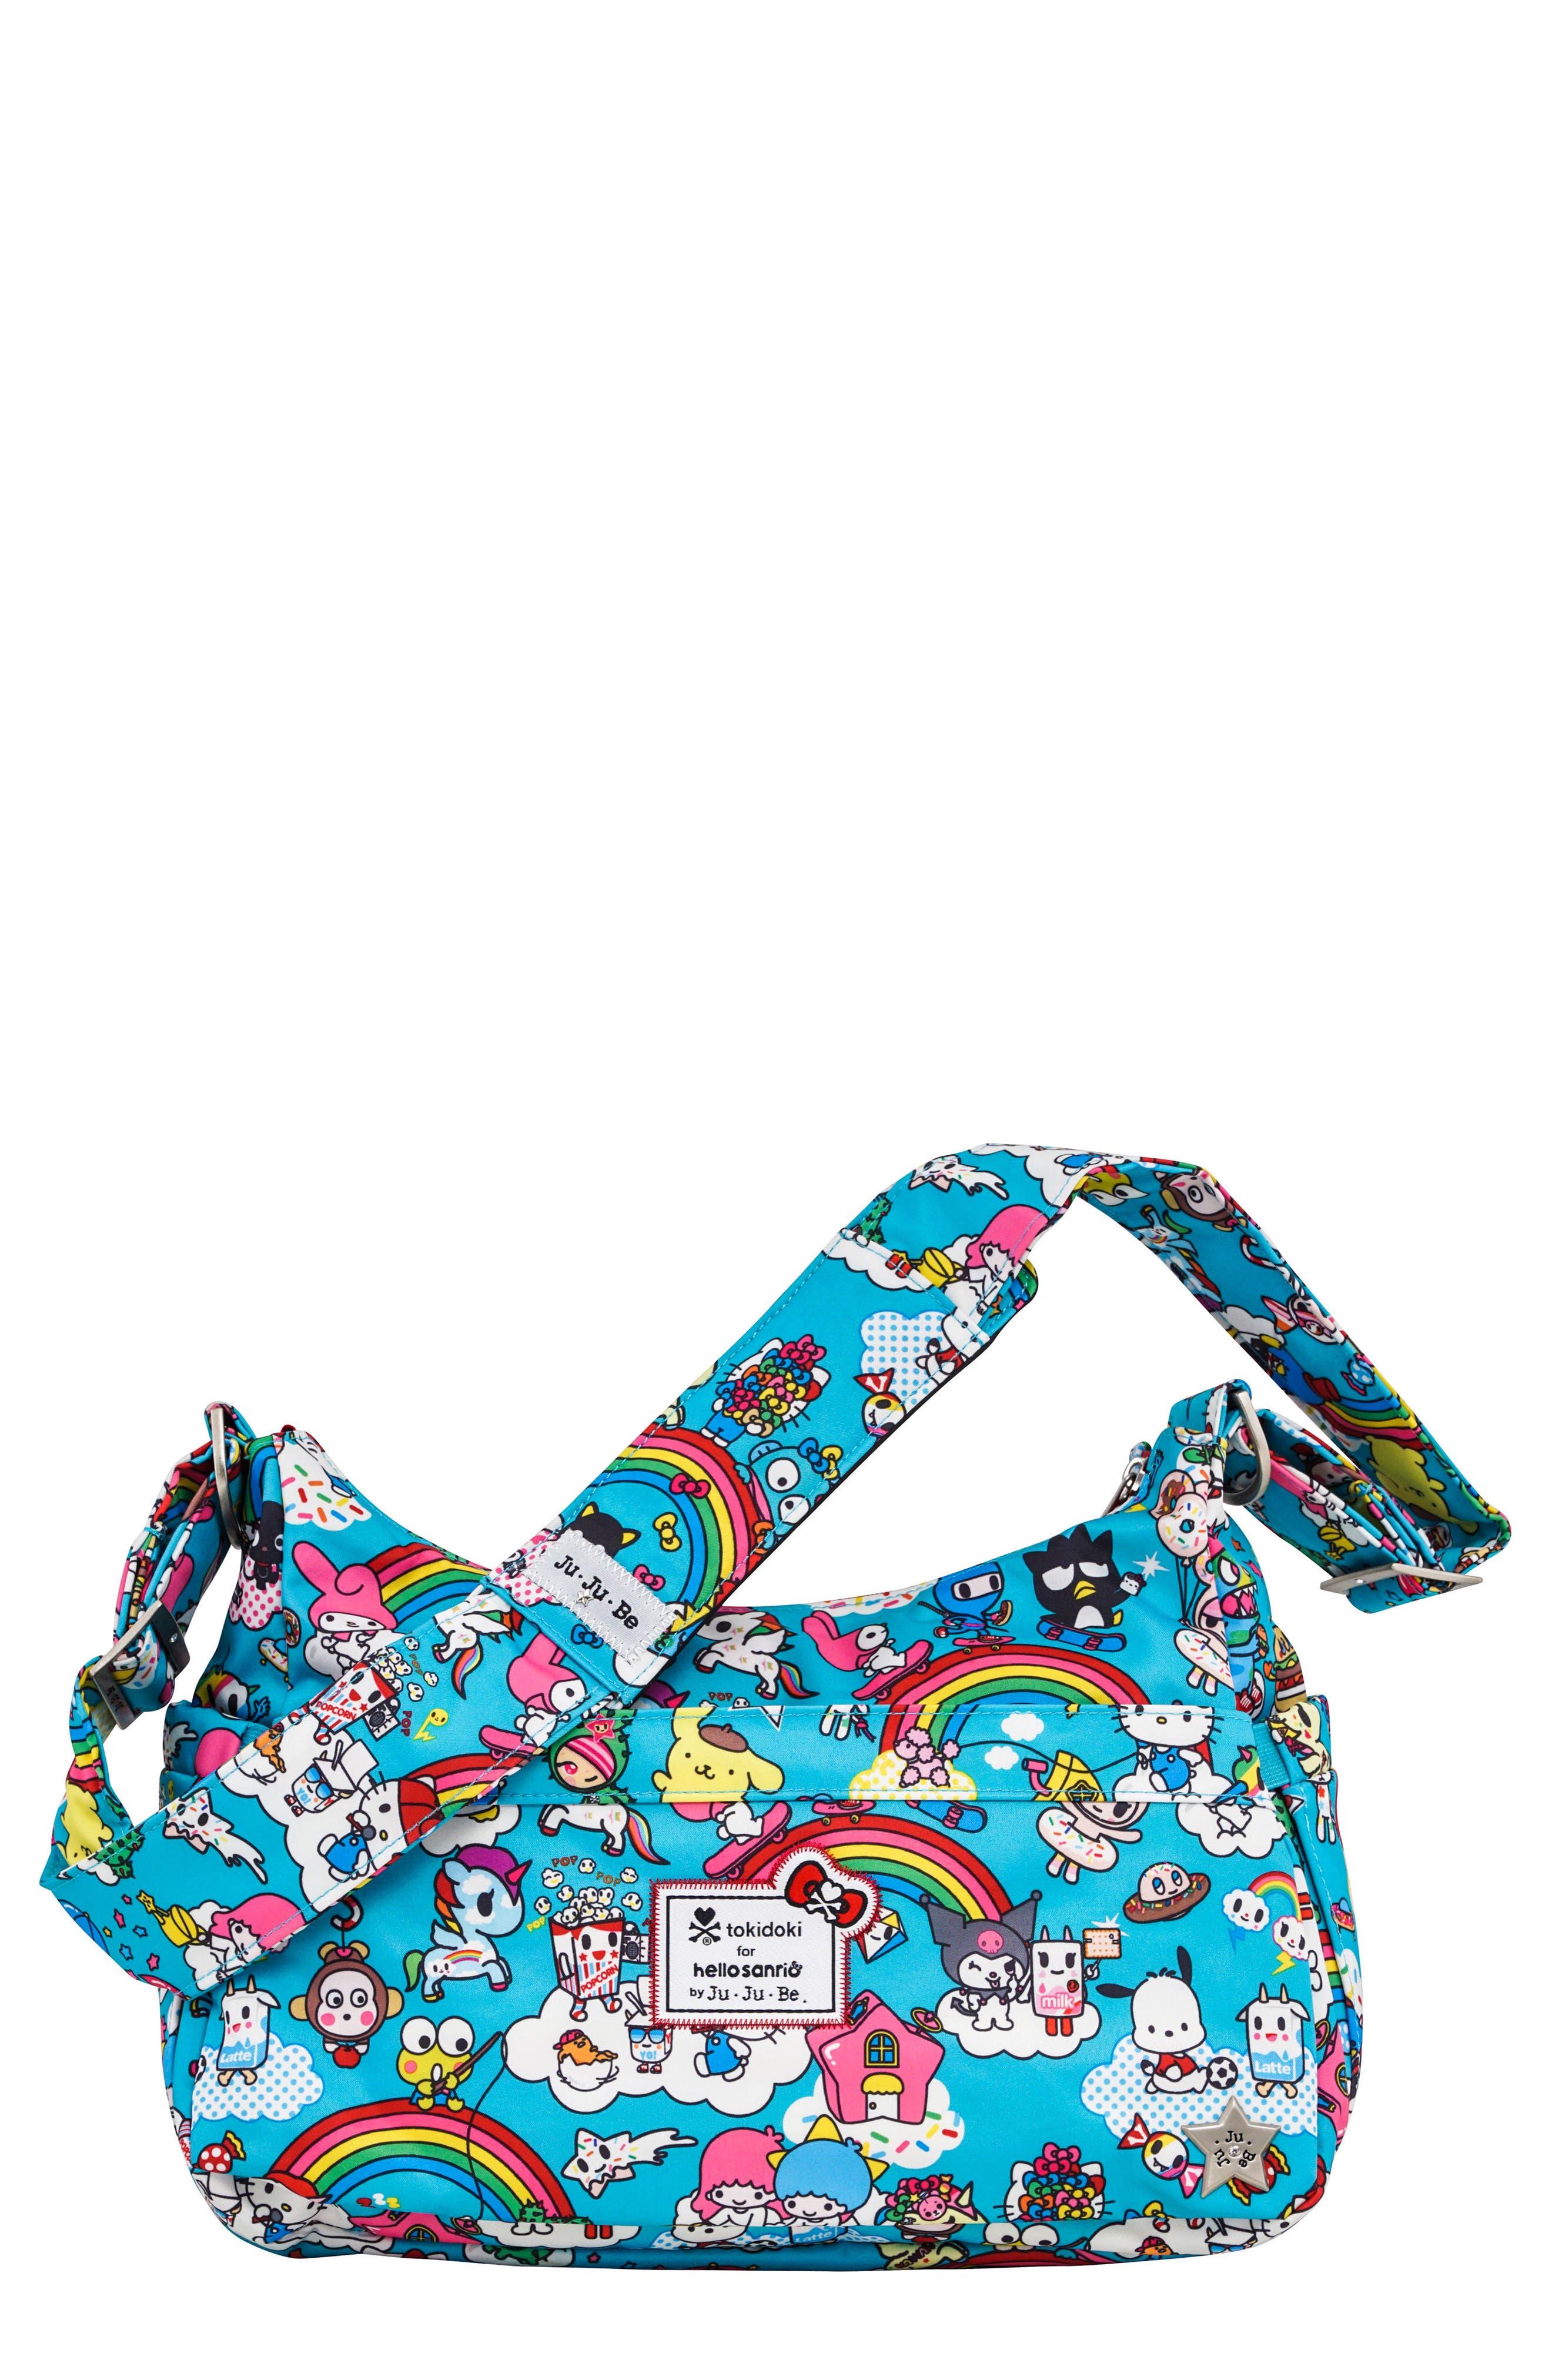 x tokidoki for Hello Sanrio Rainbow Dreams Be Hobo Diaper Bag,                         Main,                         color, 433